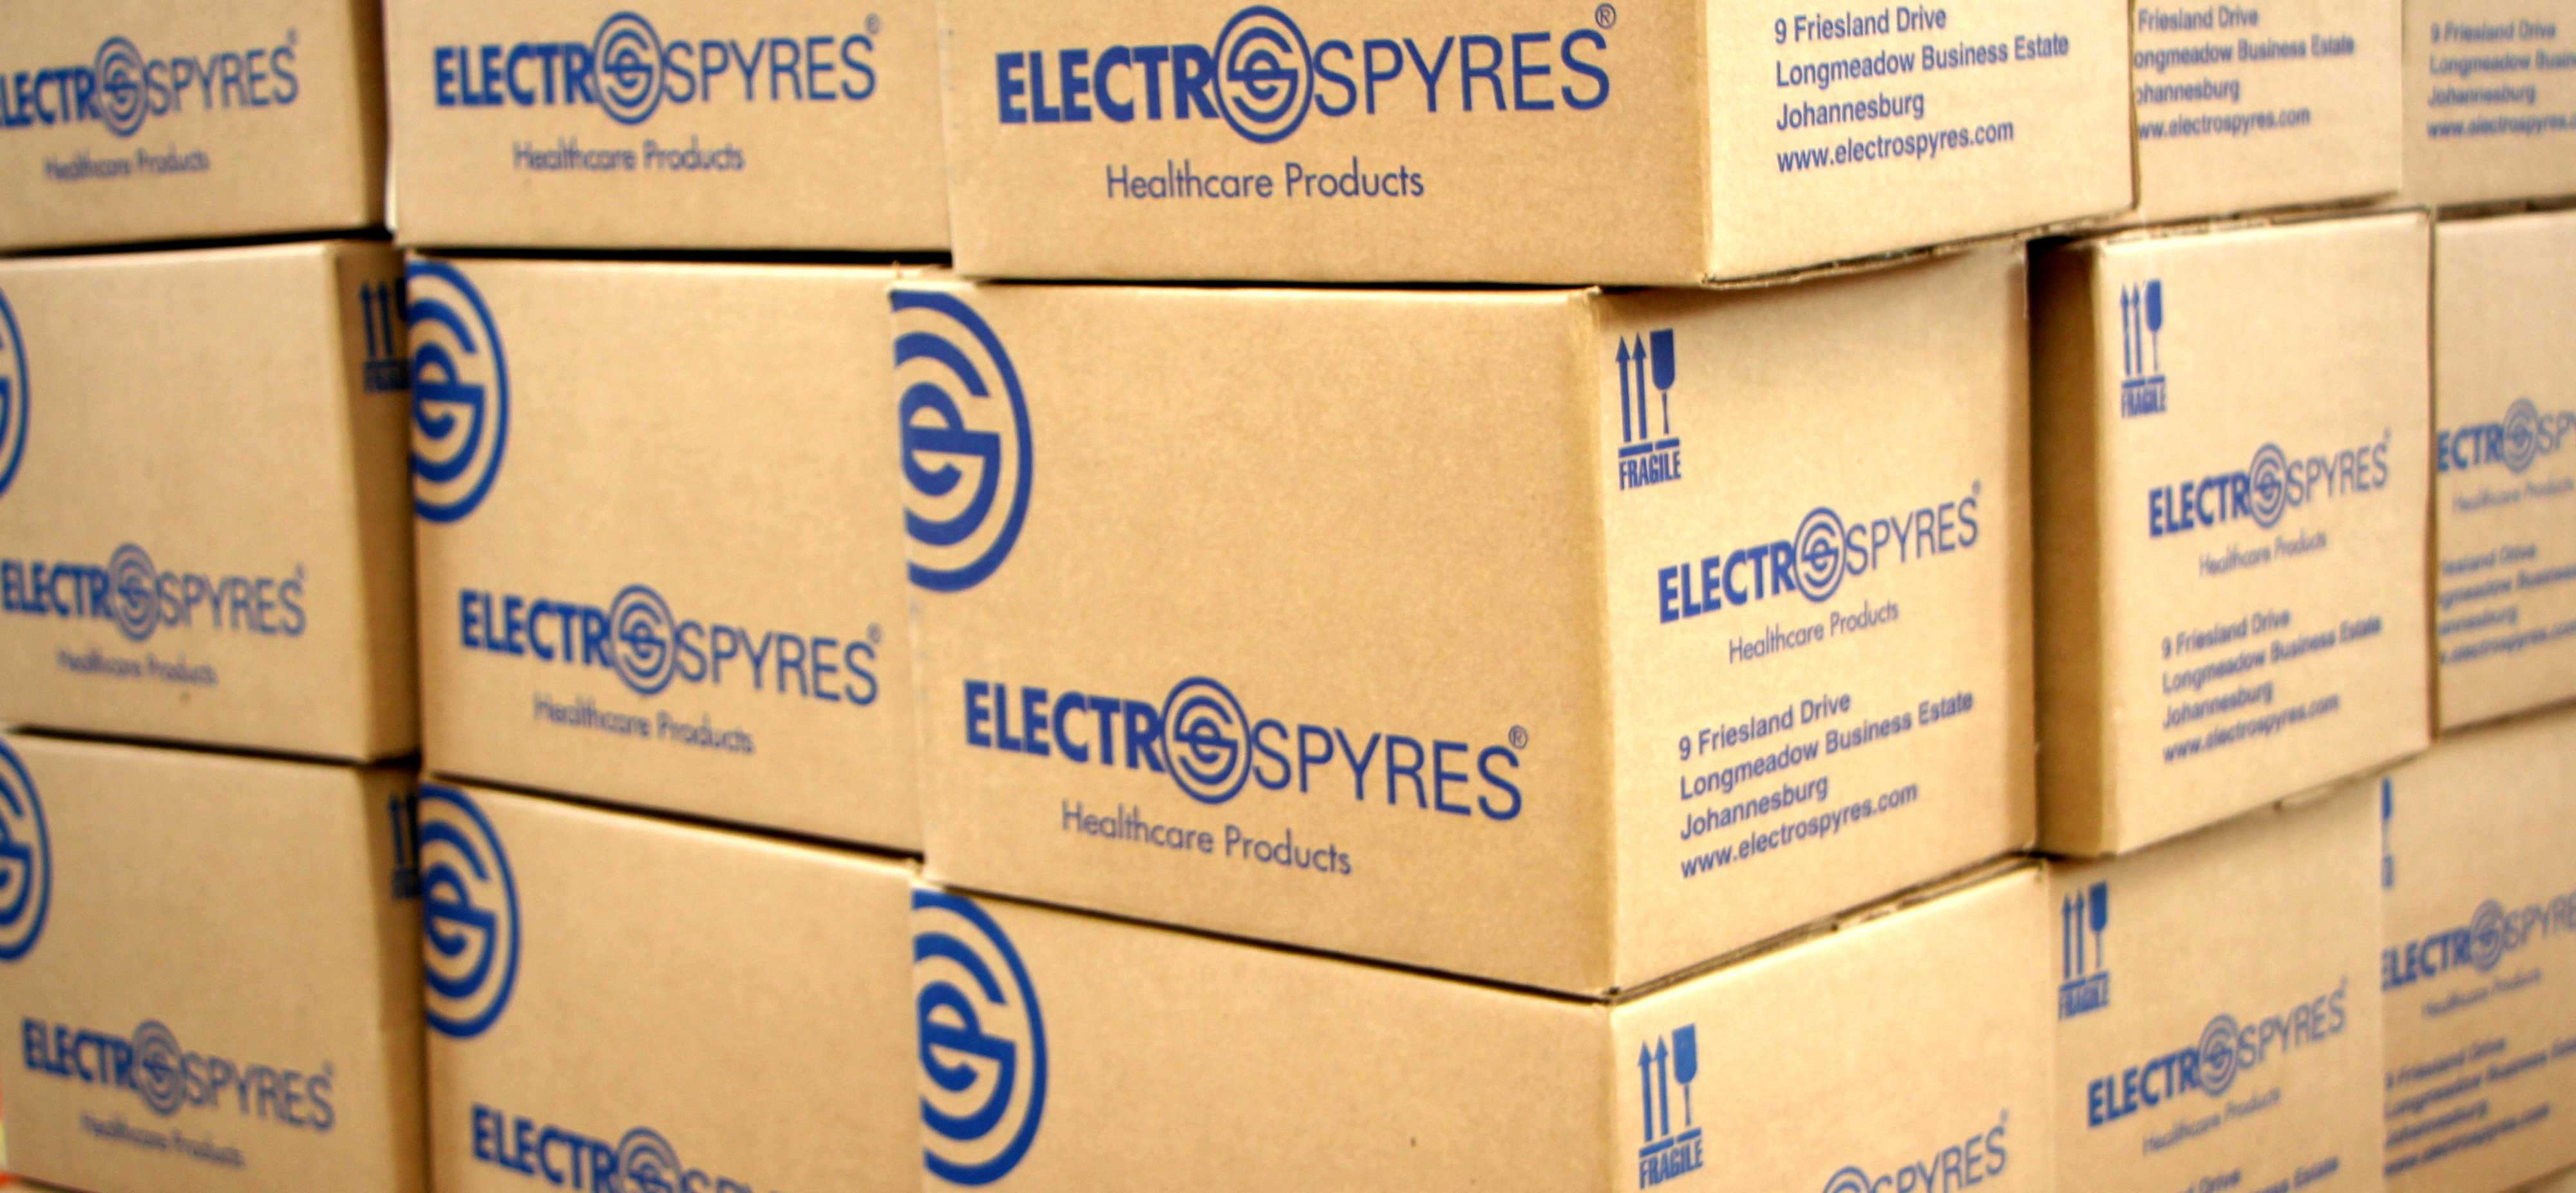 Electro Spyres Medical (Pty) Ltd